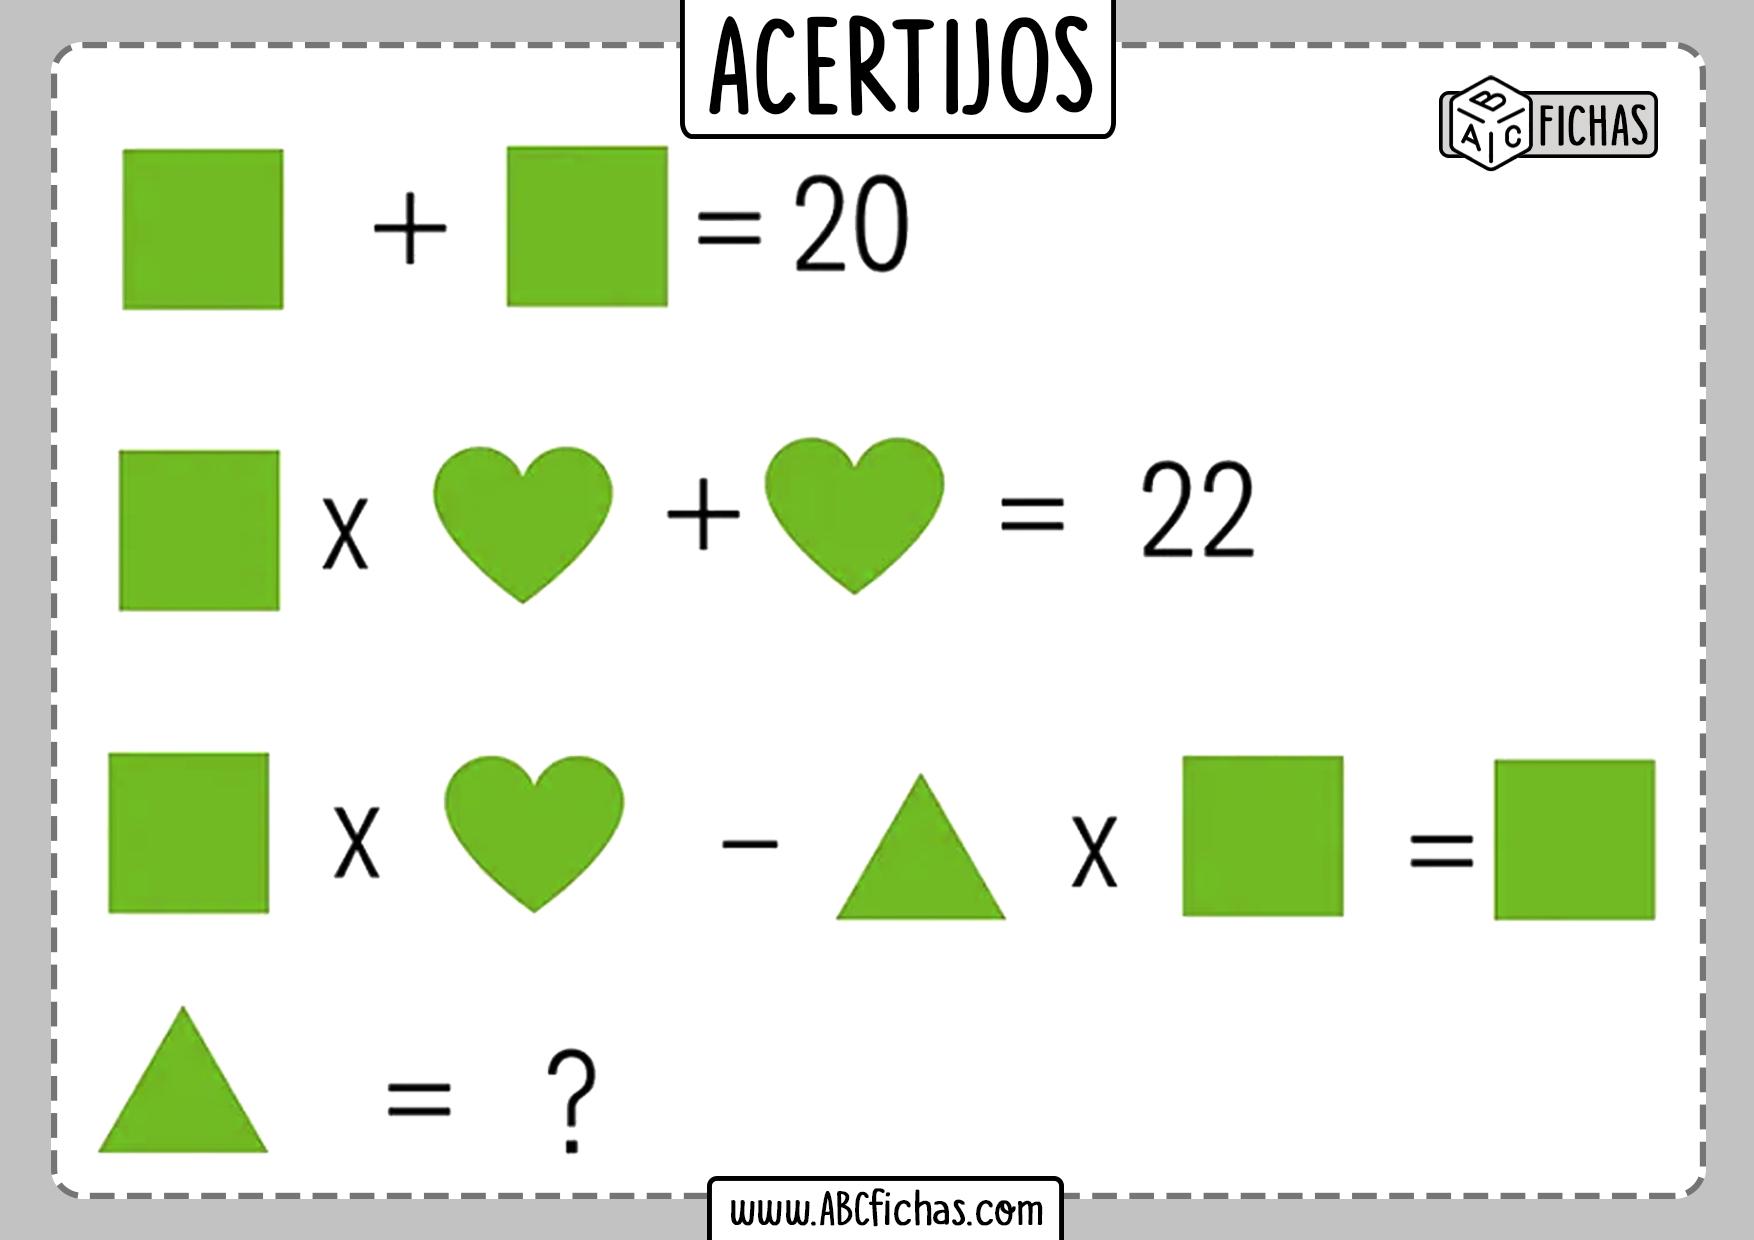 Acertijos matematicos de numeros